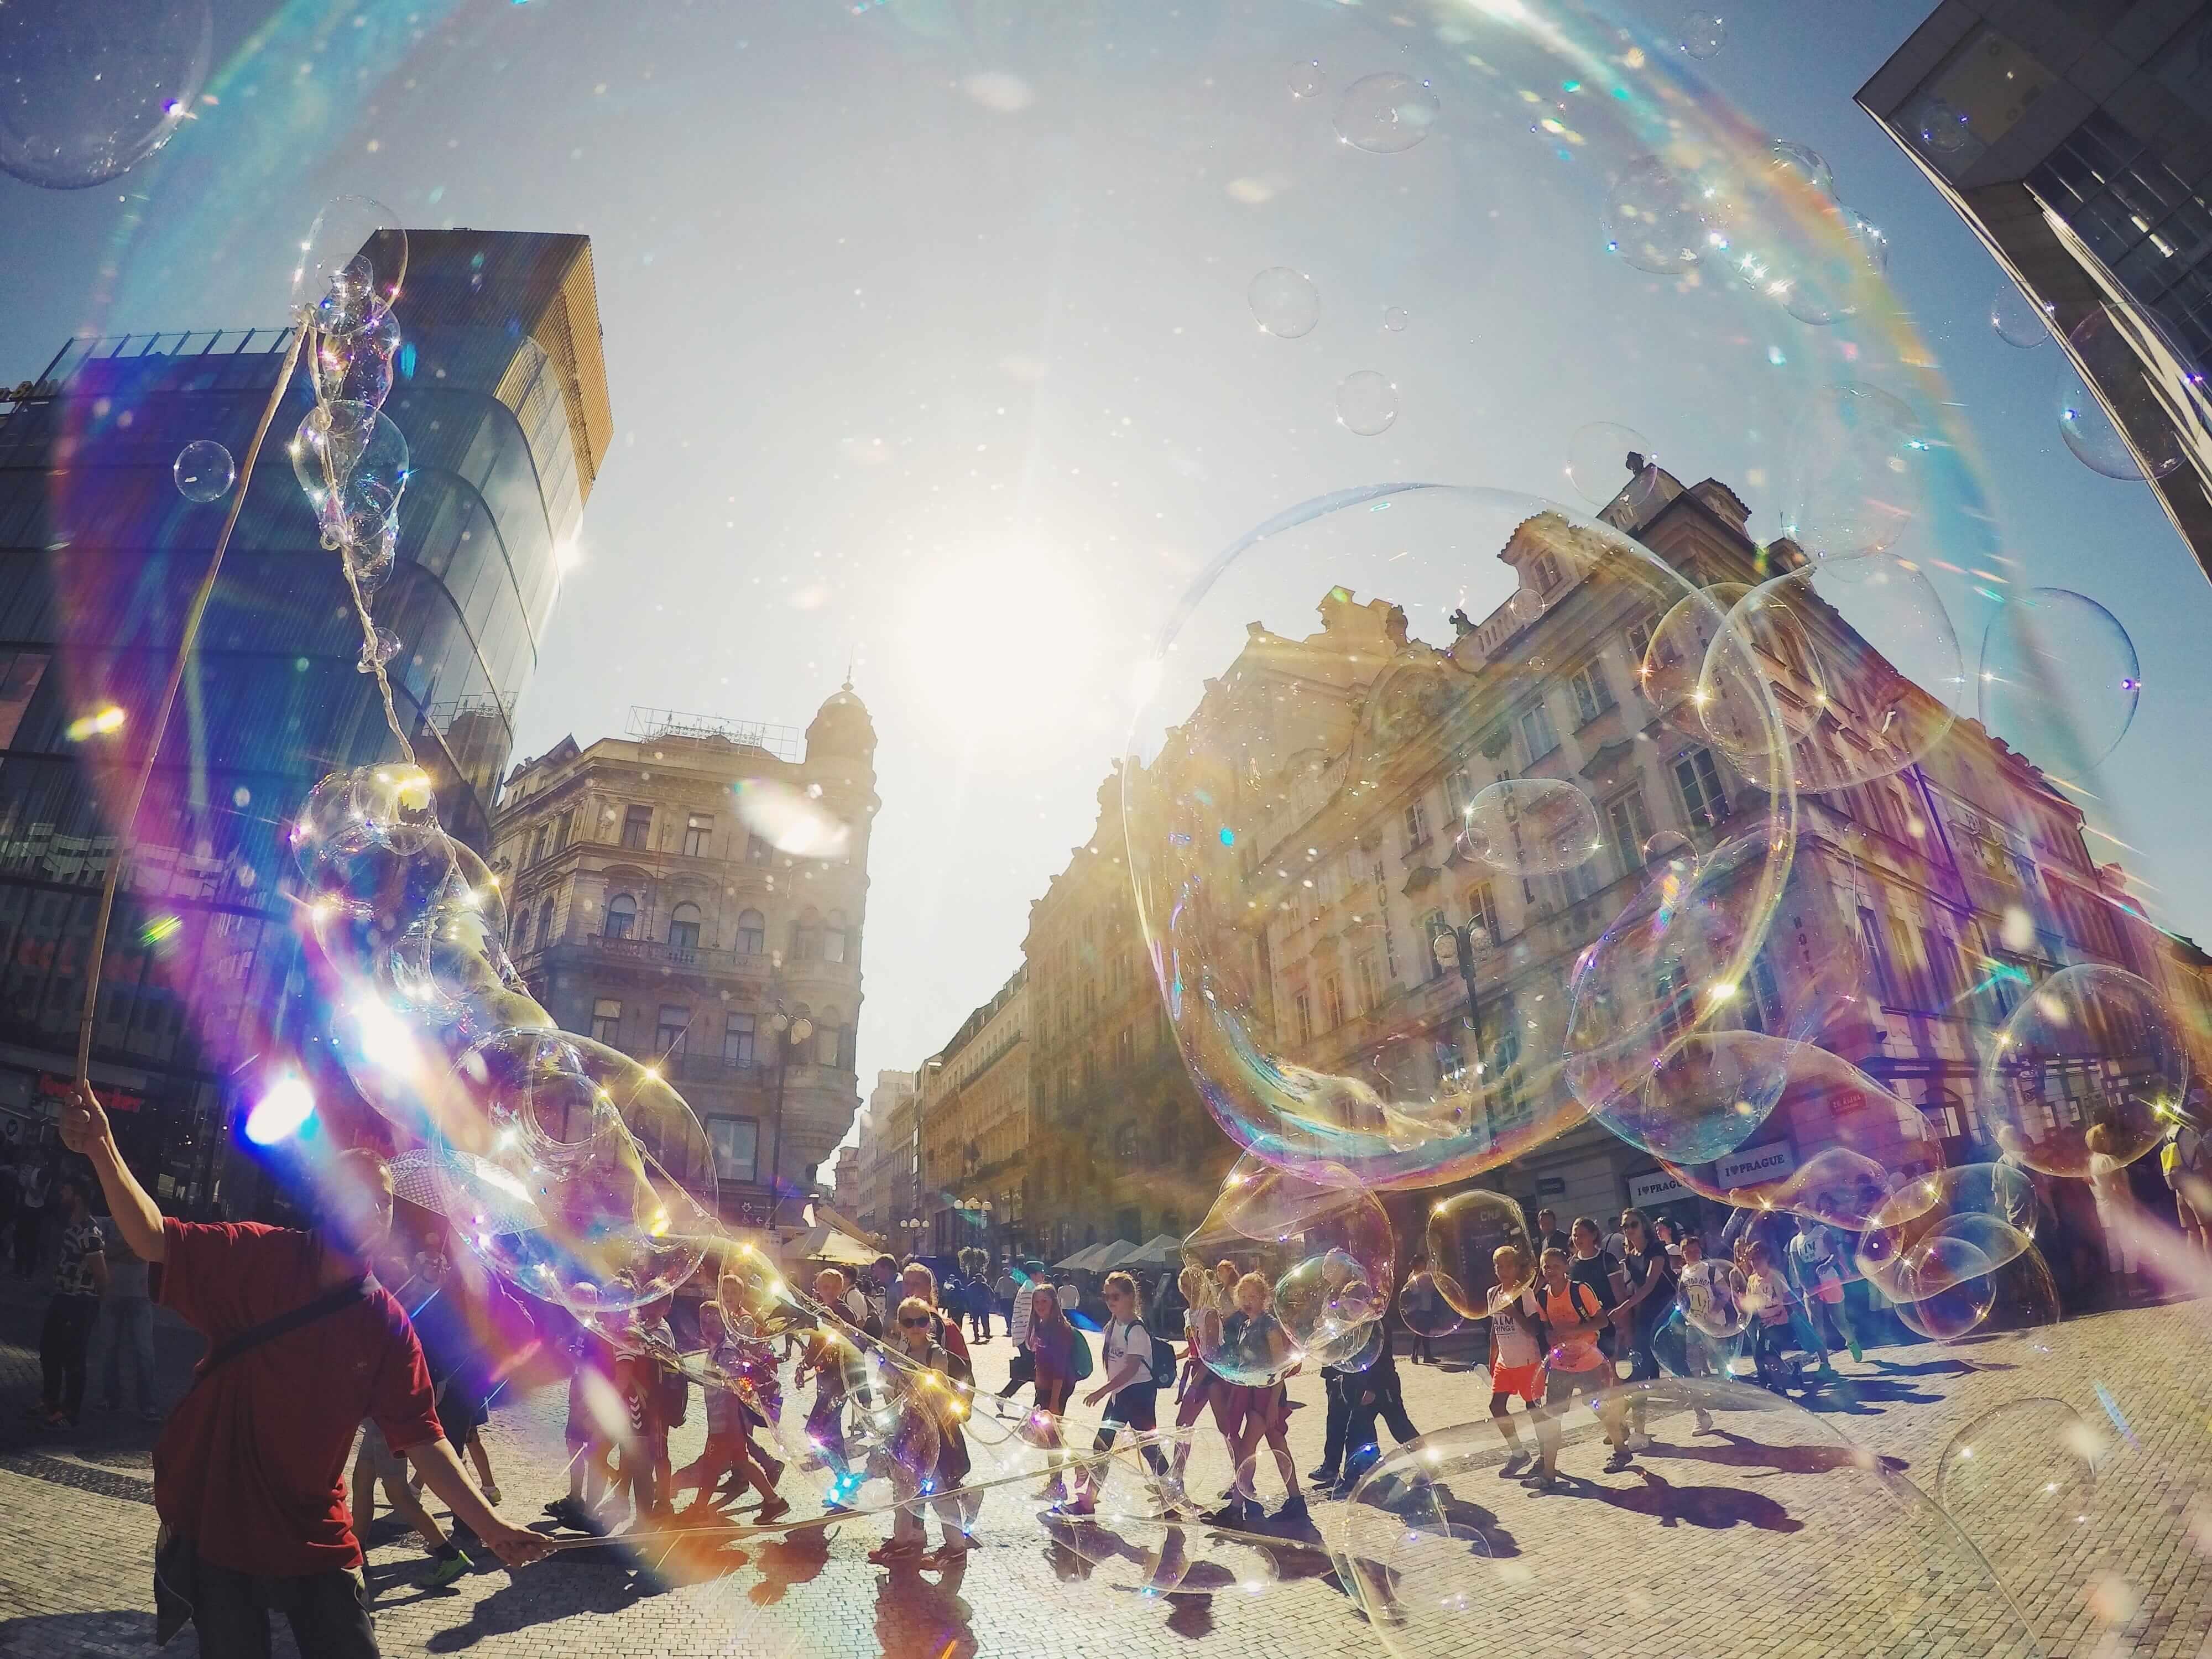 Seifenblasenperspektive